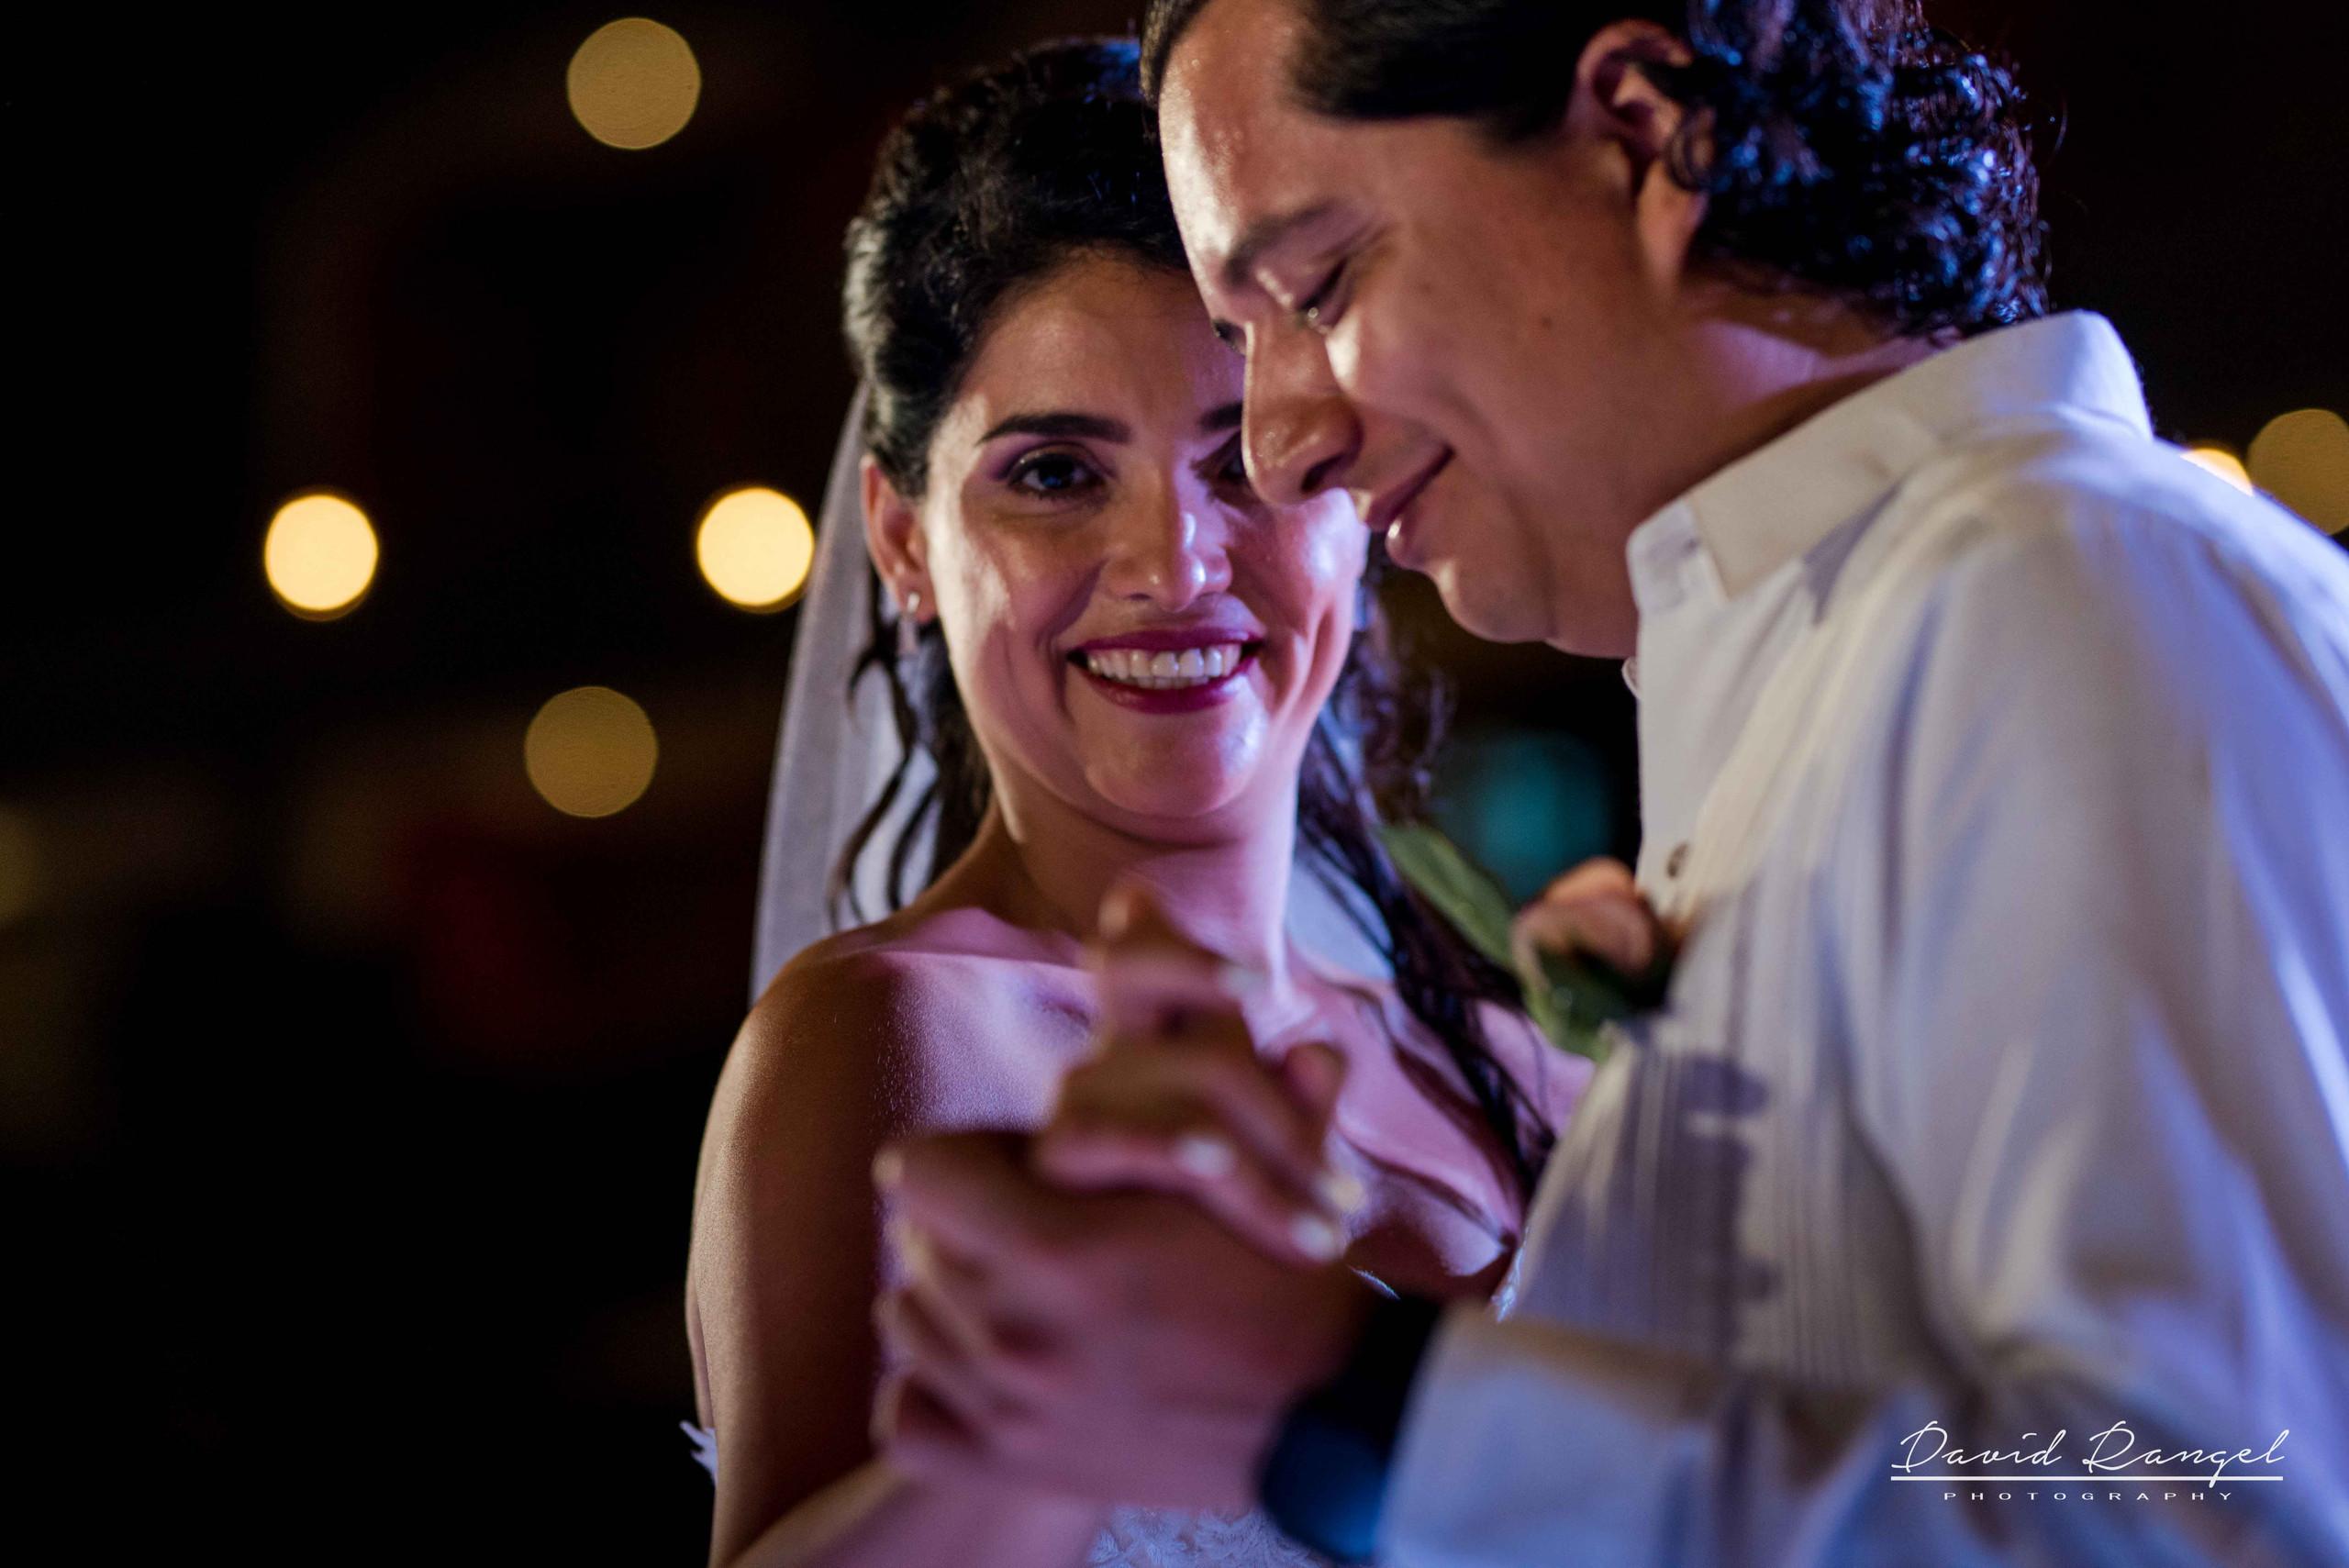 brother+bride+dance